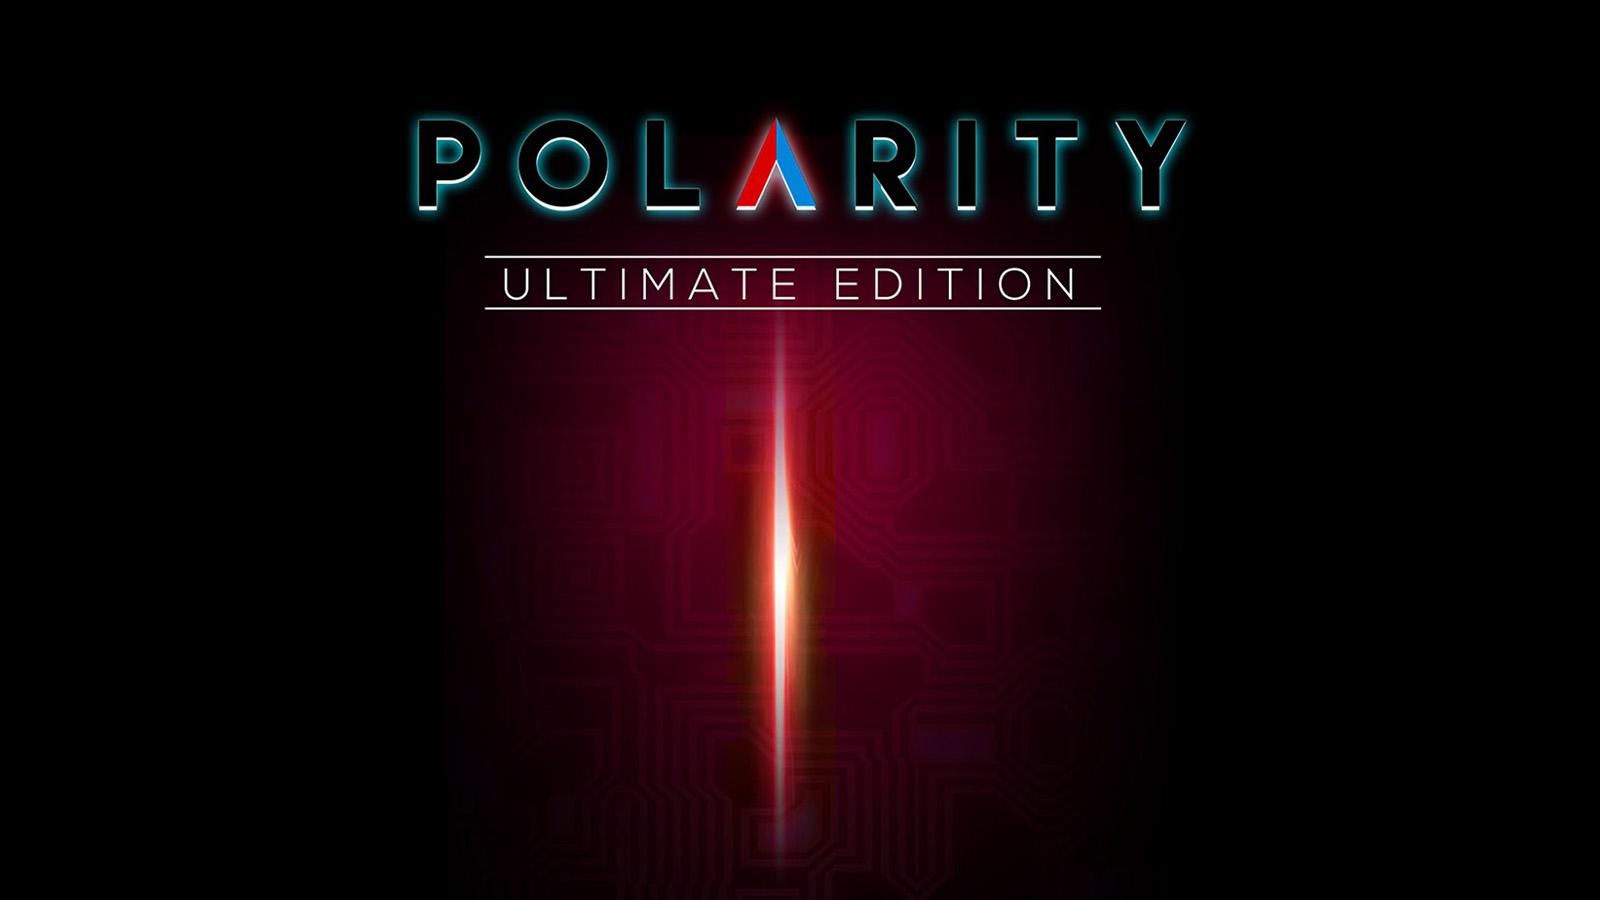 Polarity: Ultimate Edition